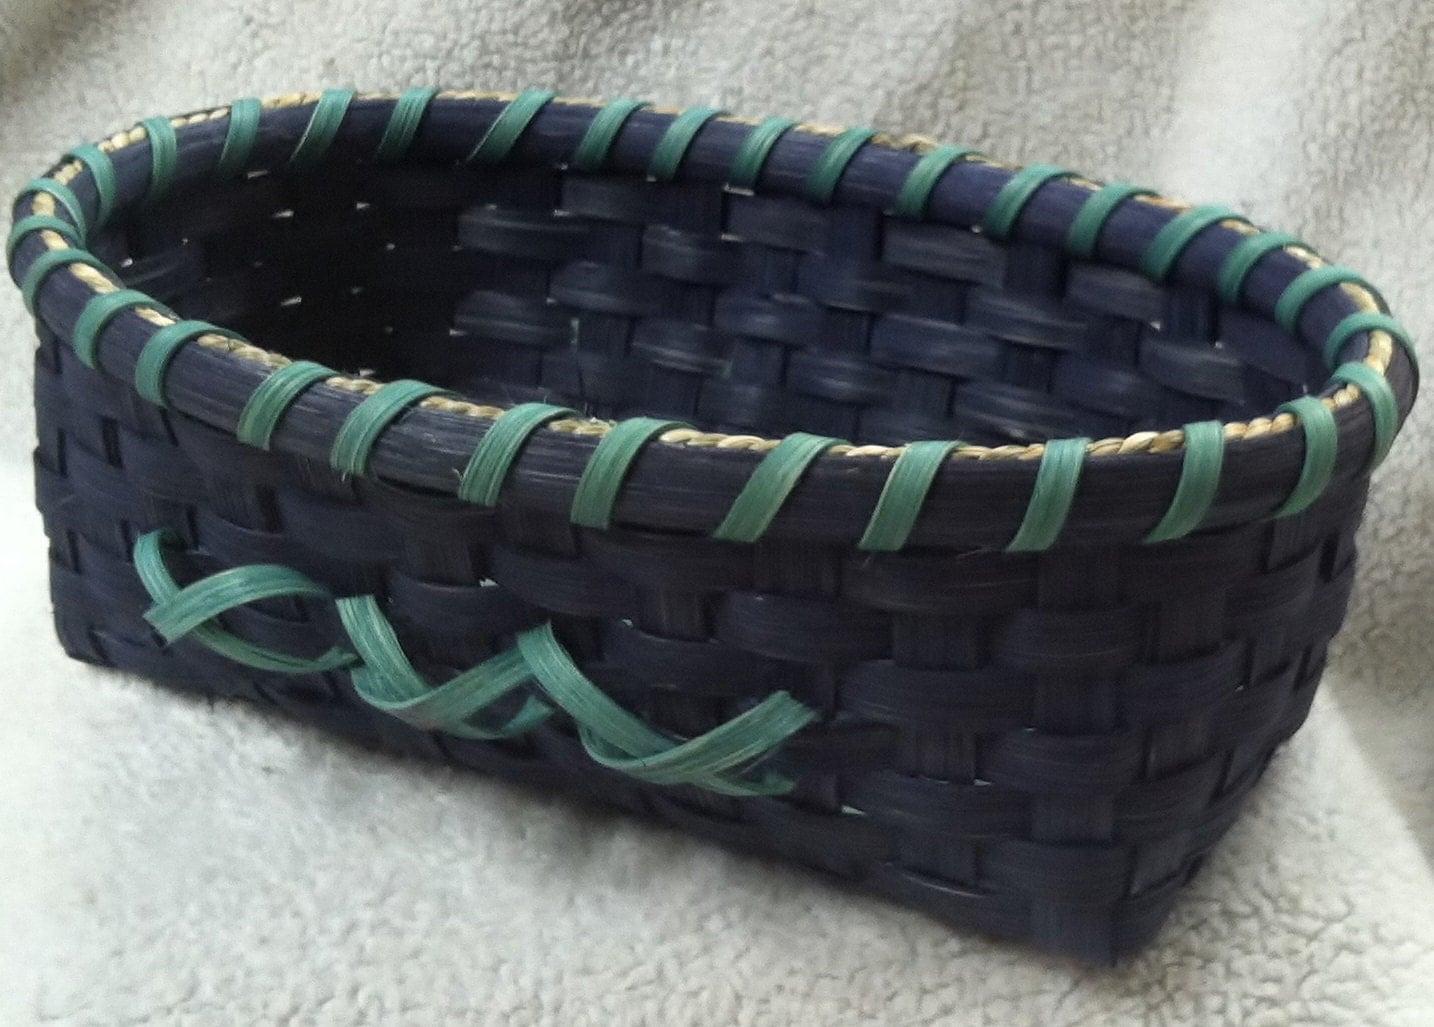 Basket Weaving Kits : Elegant bread basket weaving kit